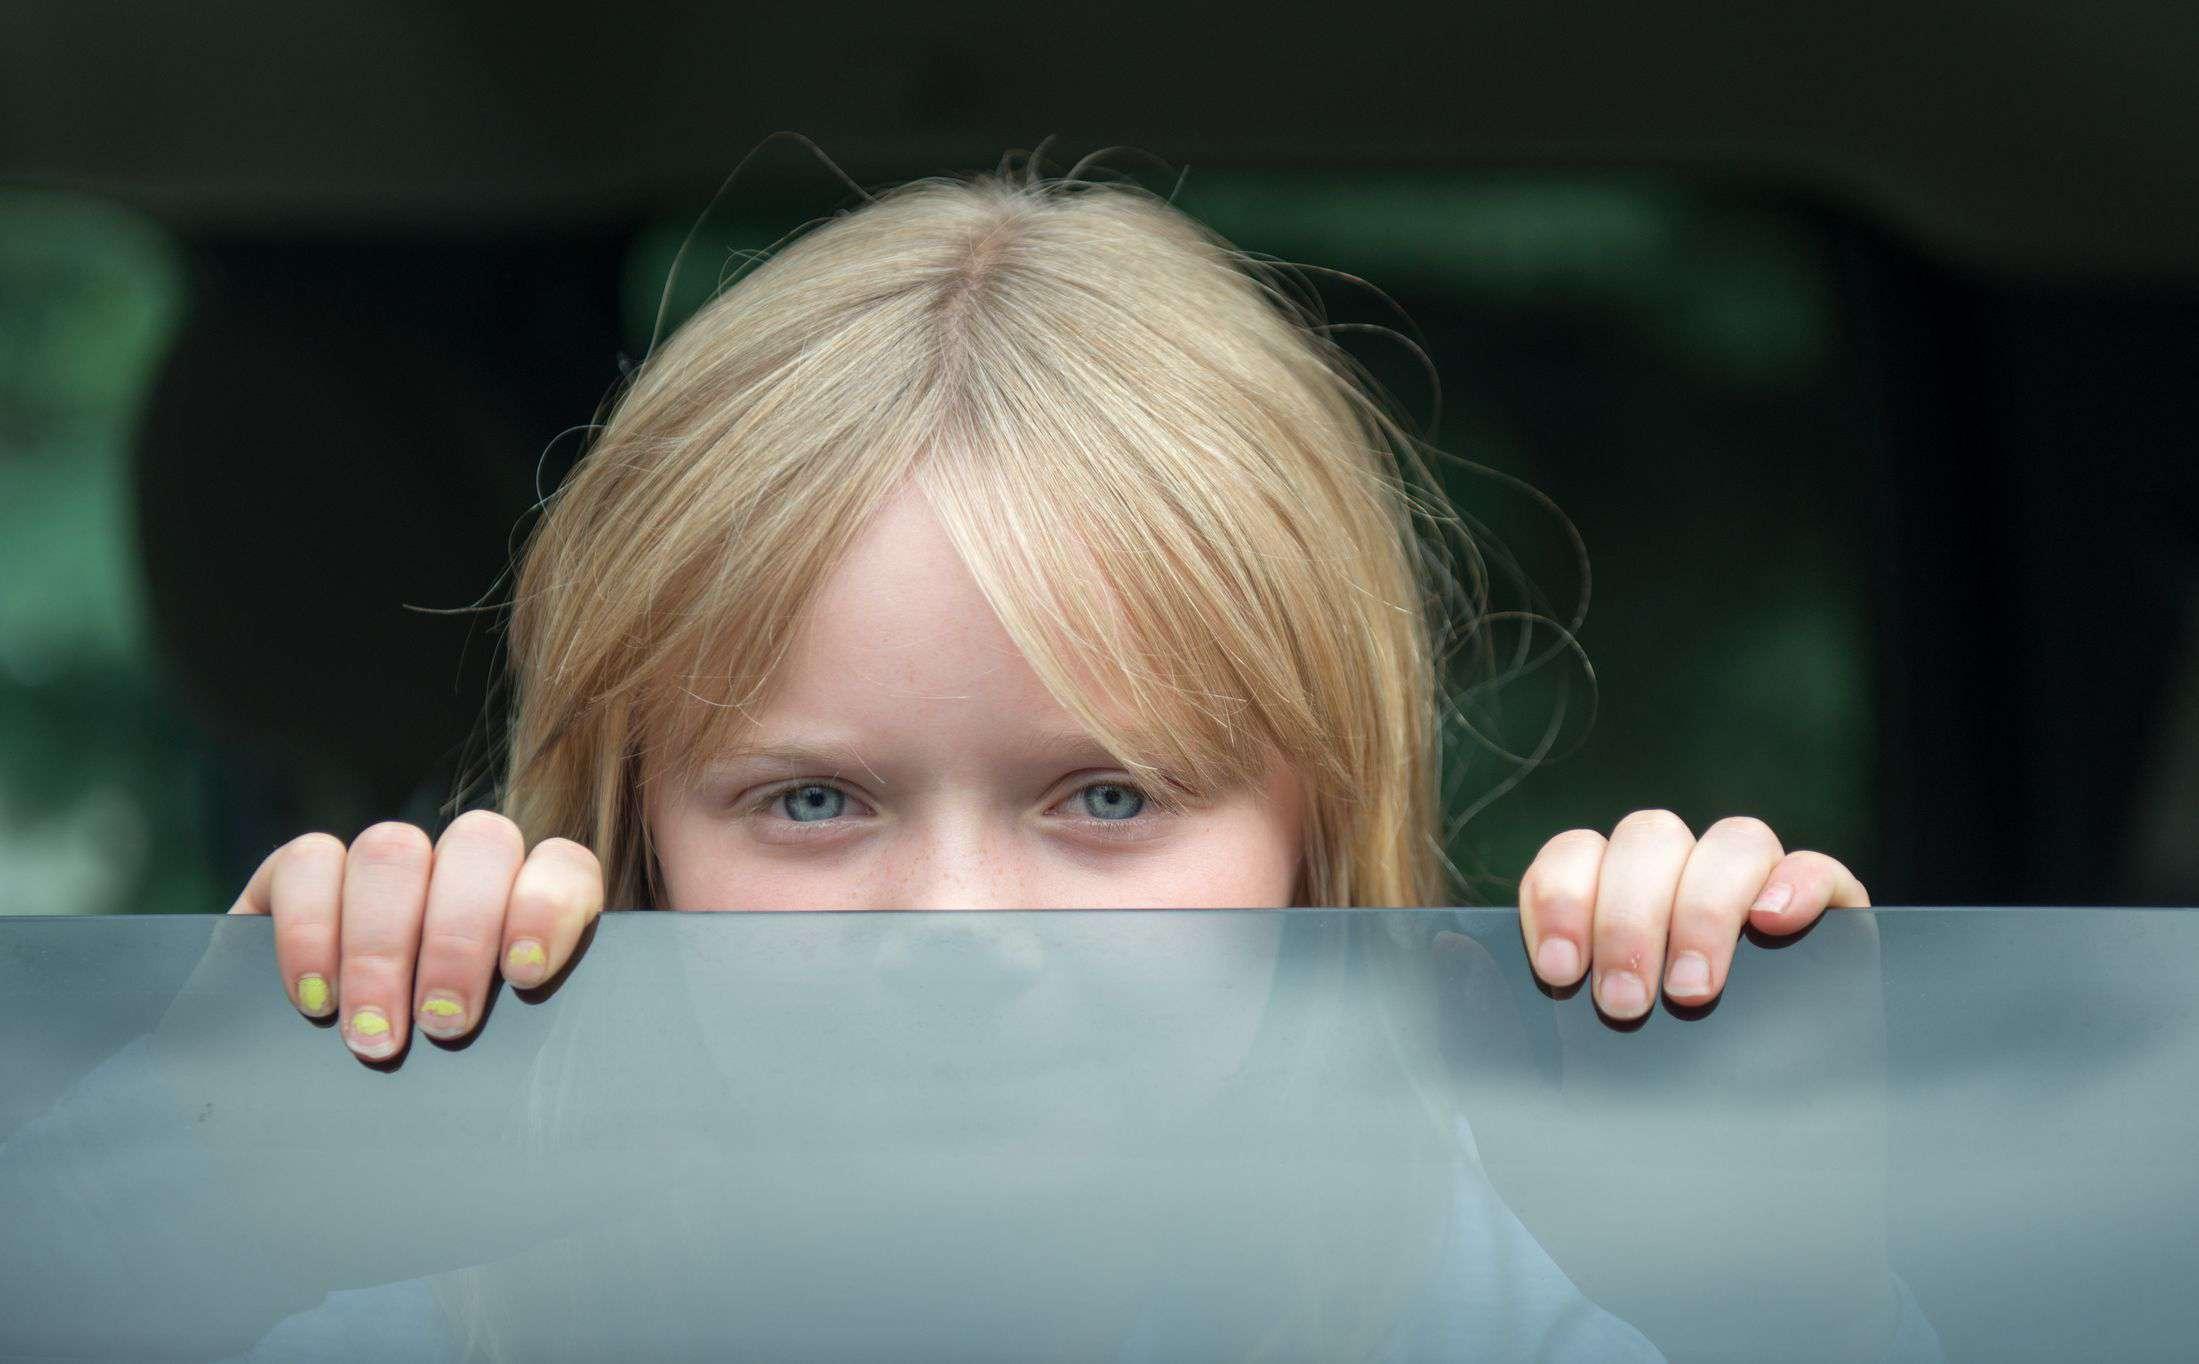 Little girl looking through a car window.